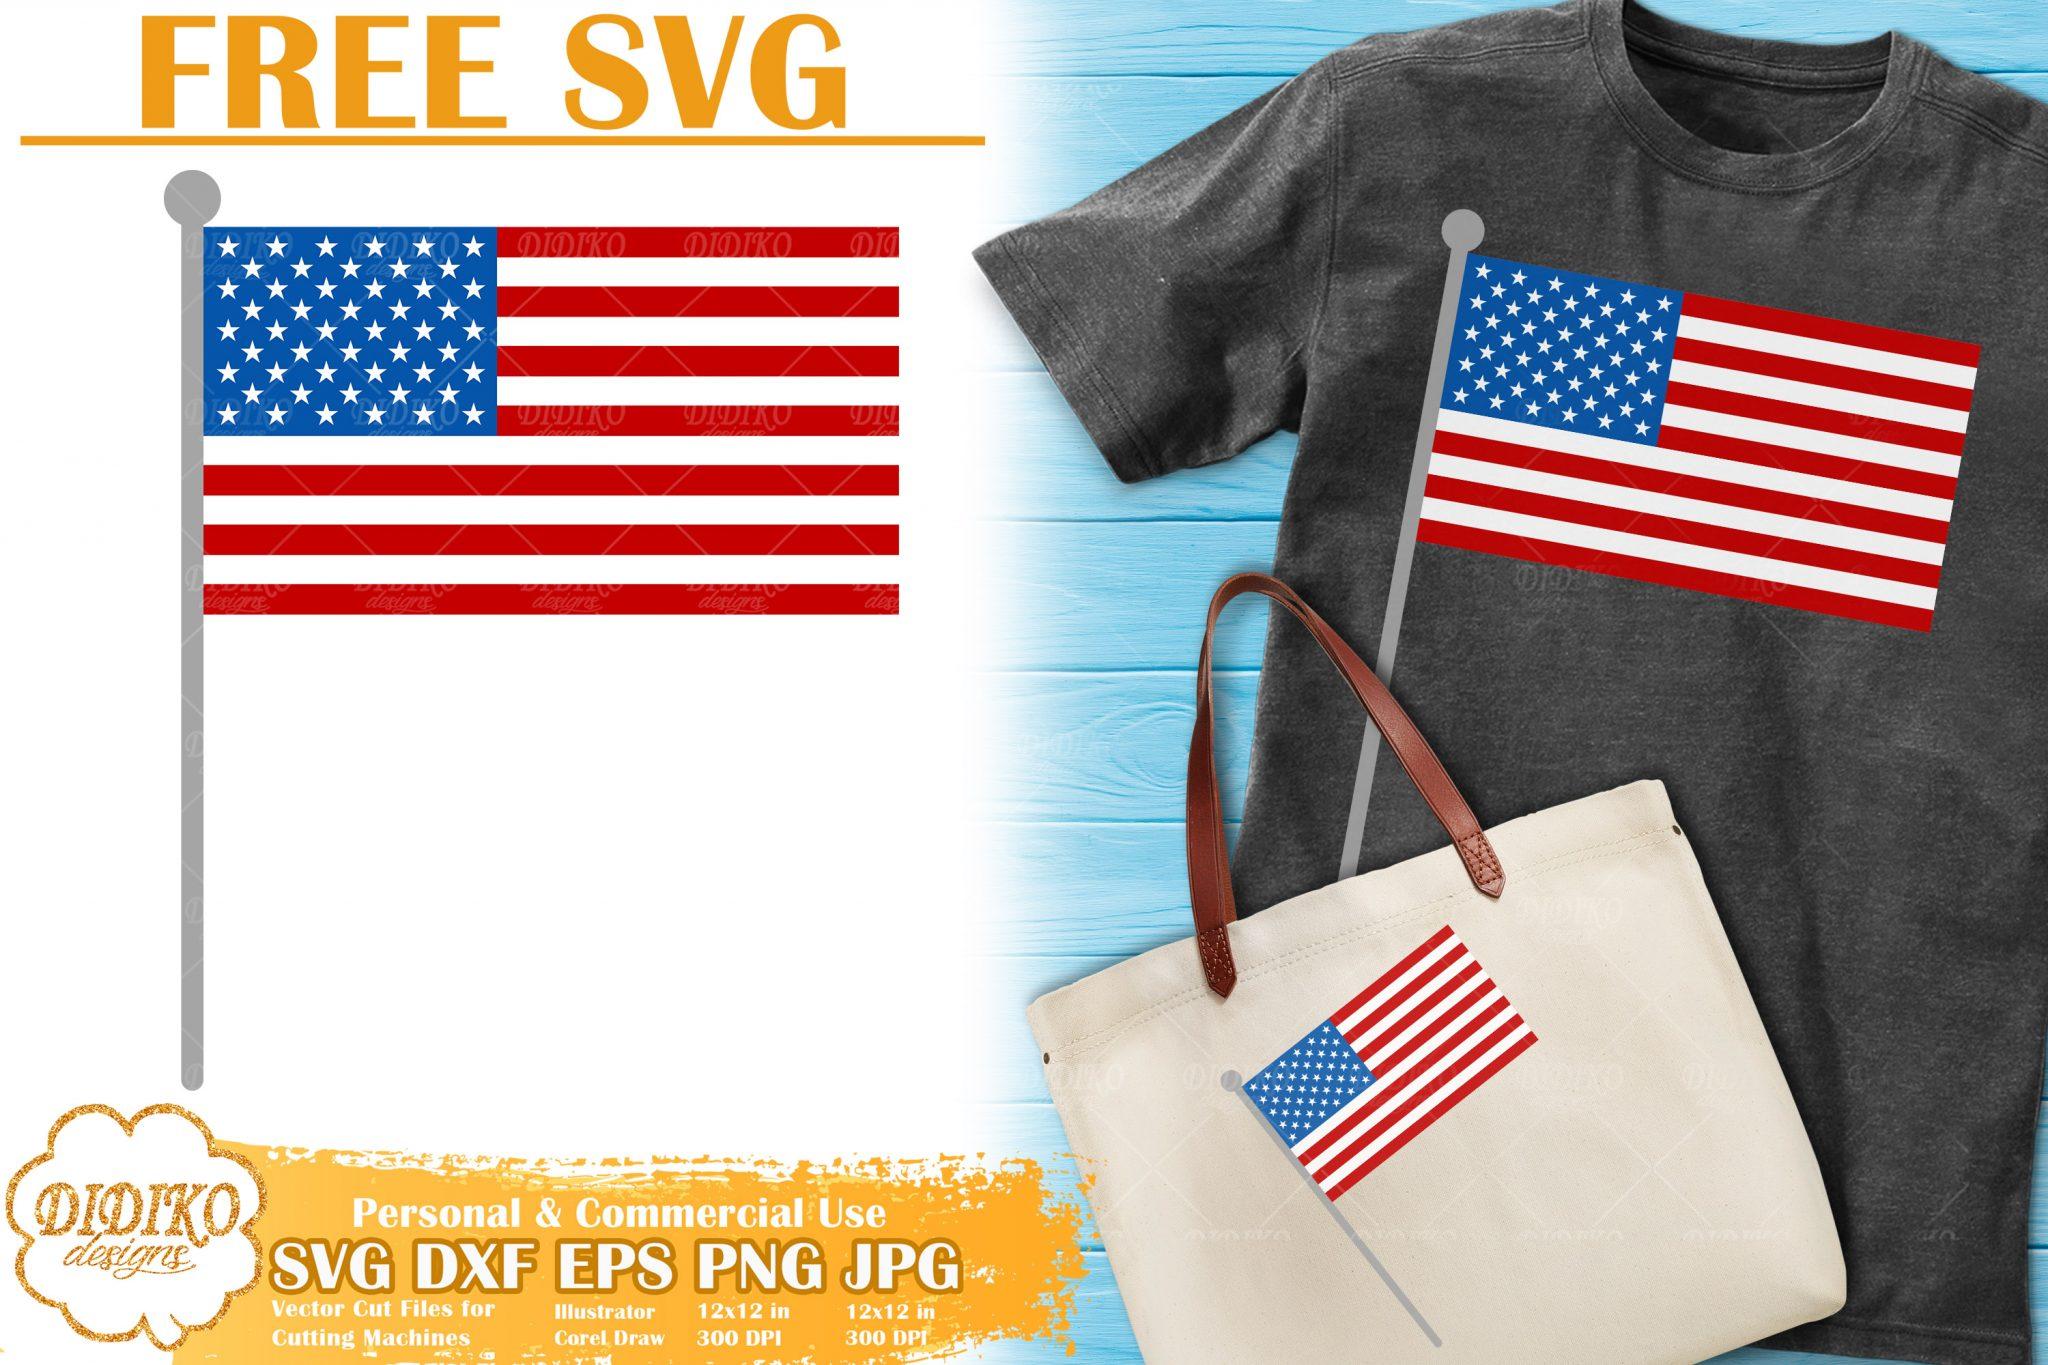 merican Flag Free SVG   4th of July Free SVG Cricut